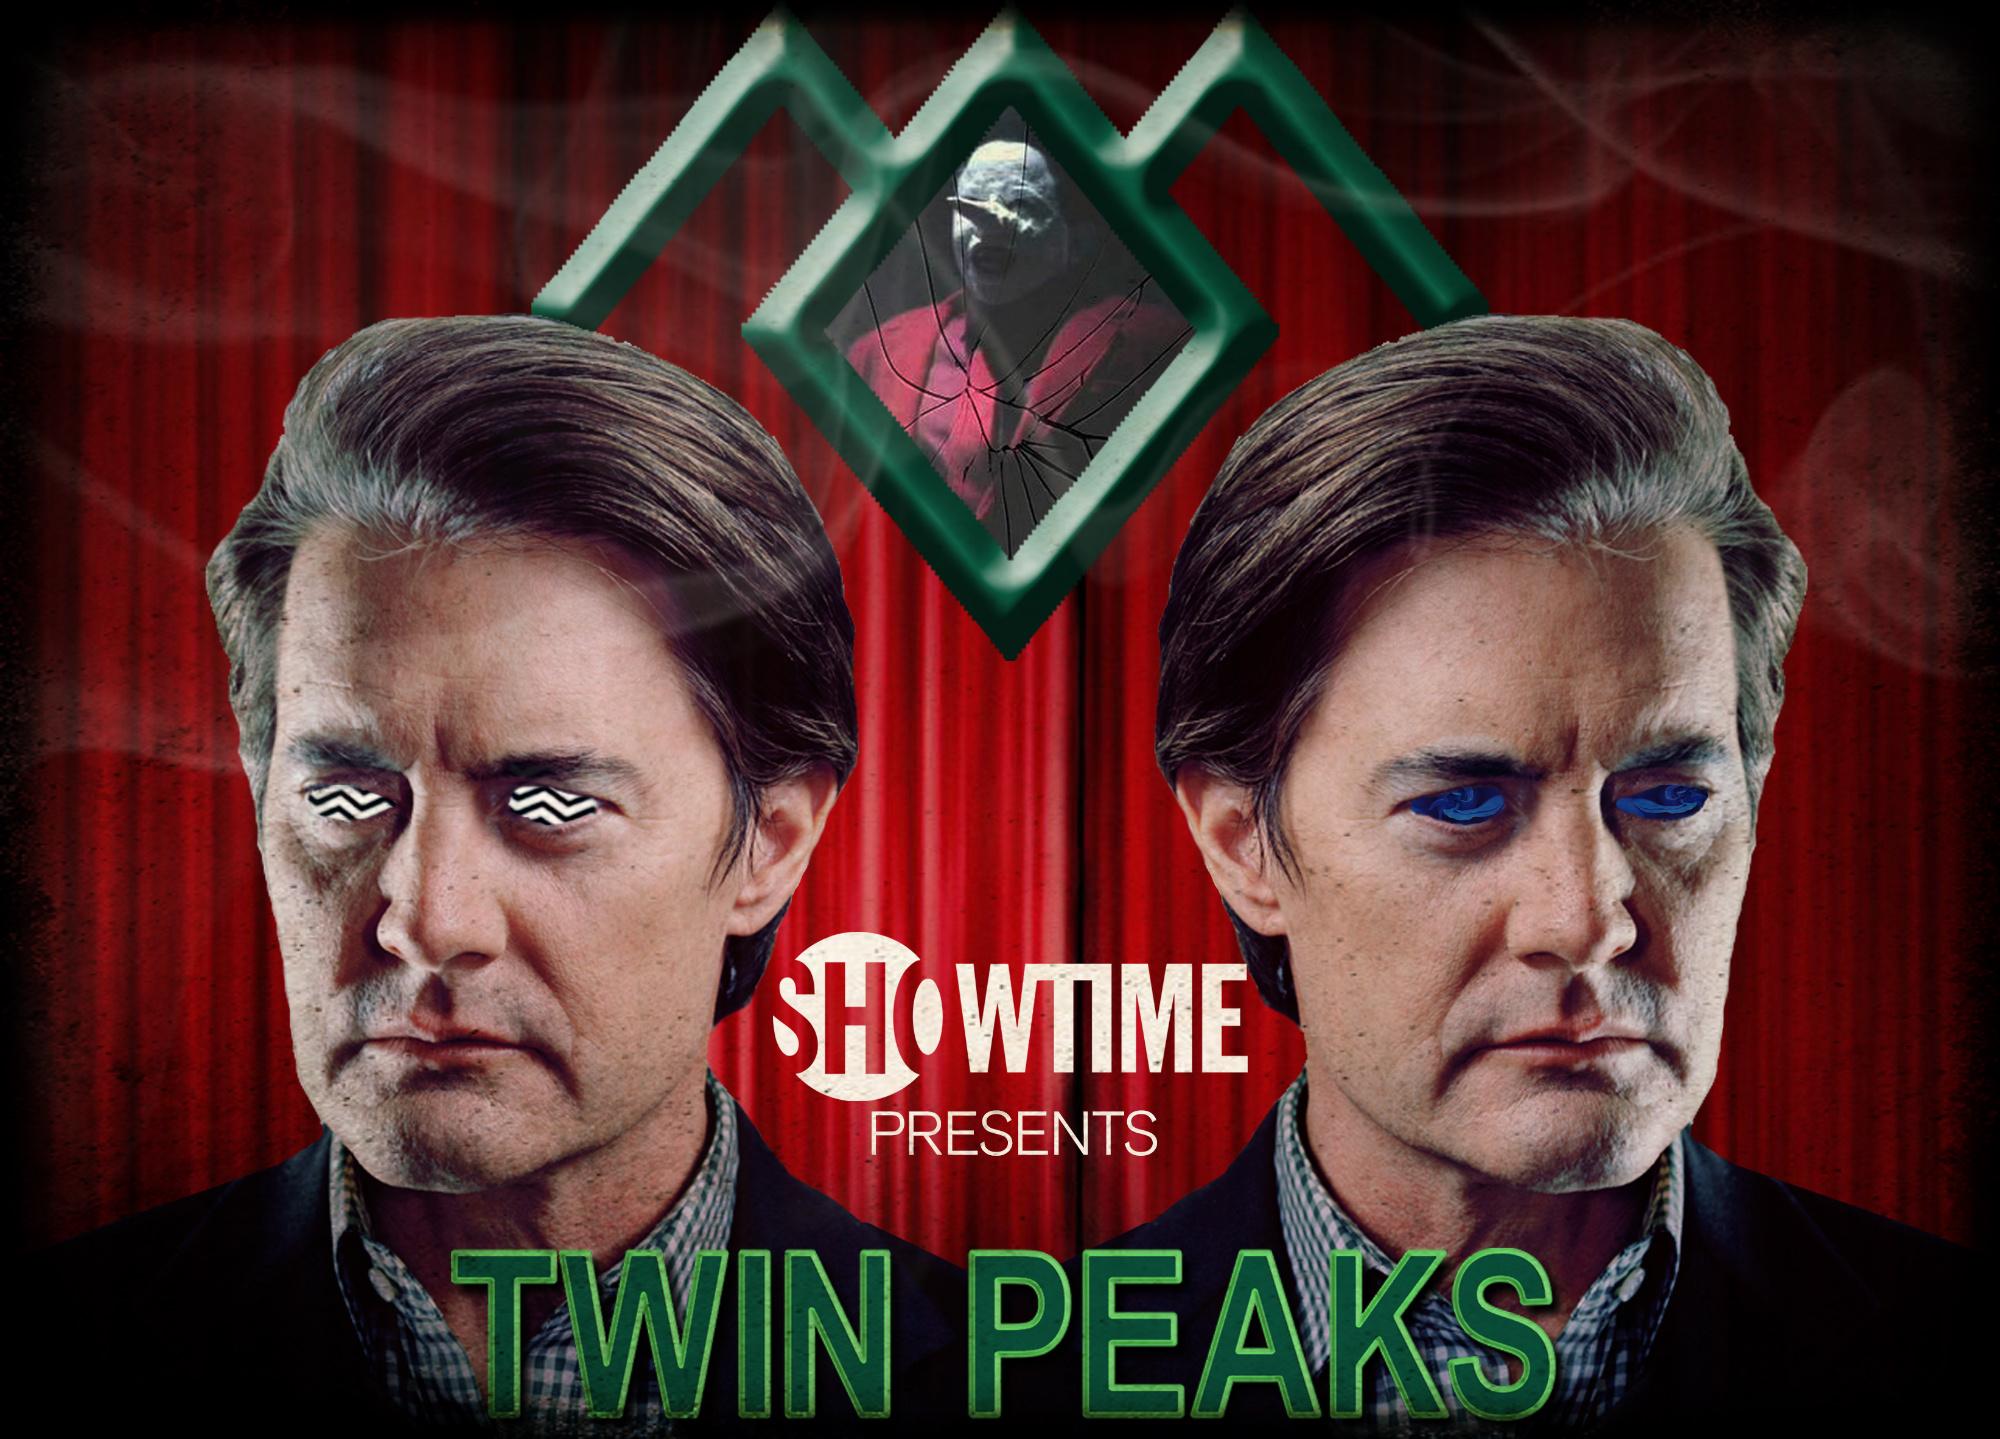 twin peaks season 3filteredborder.jpg